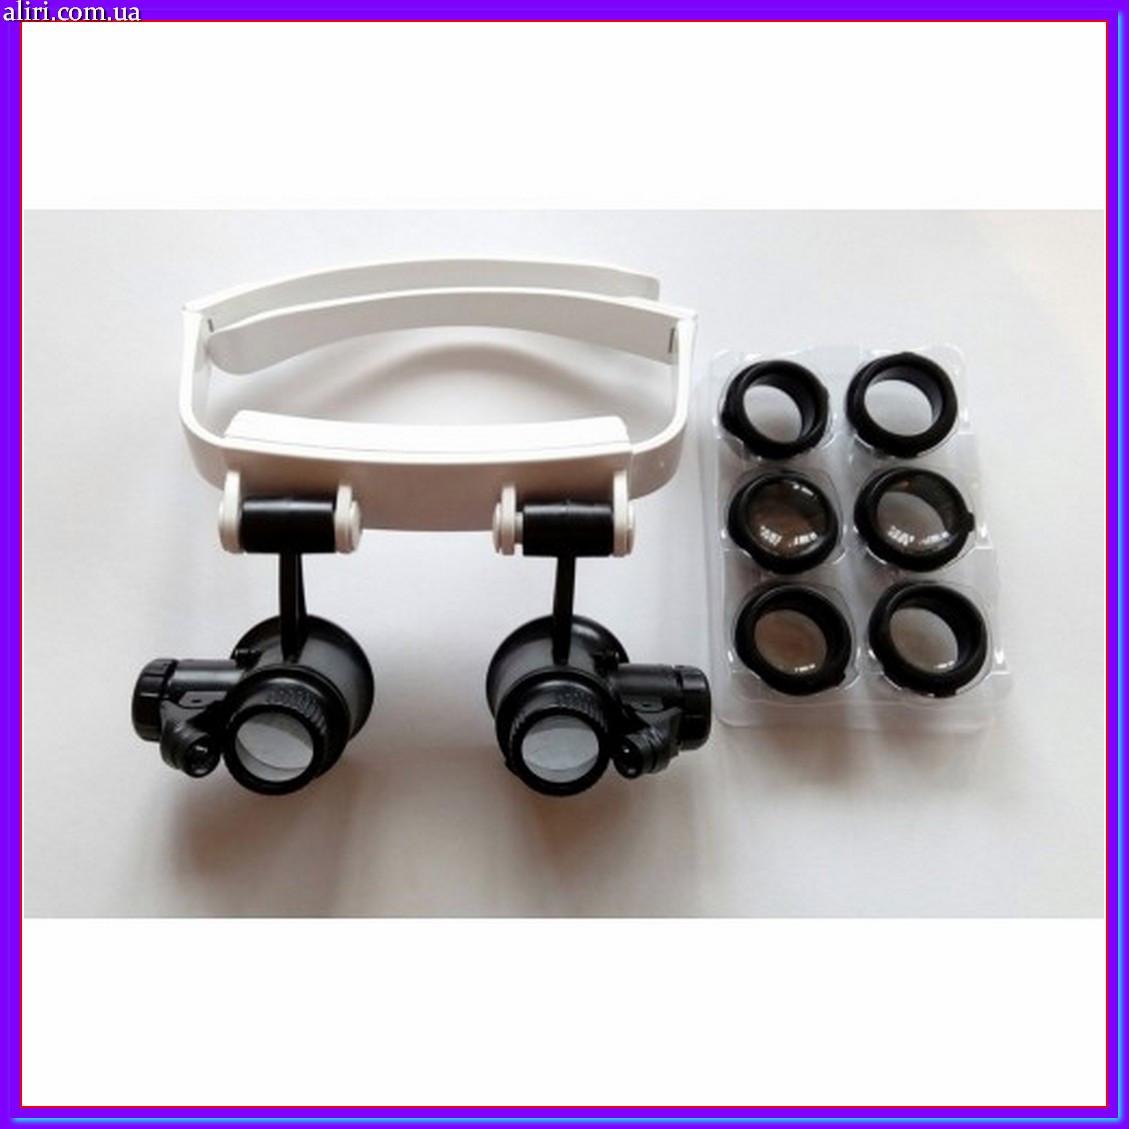 Бинокулярные очки с LED подсветкой TH-9202 (10x/15x/20x/25x)